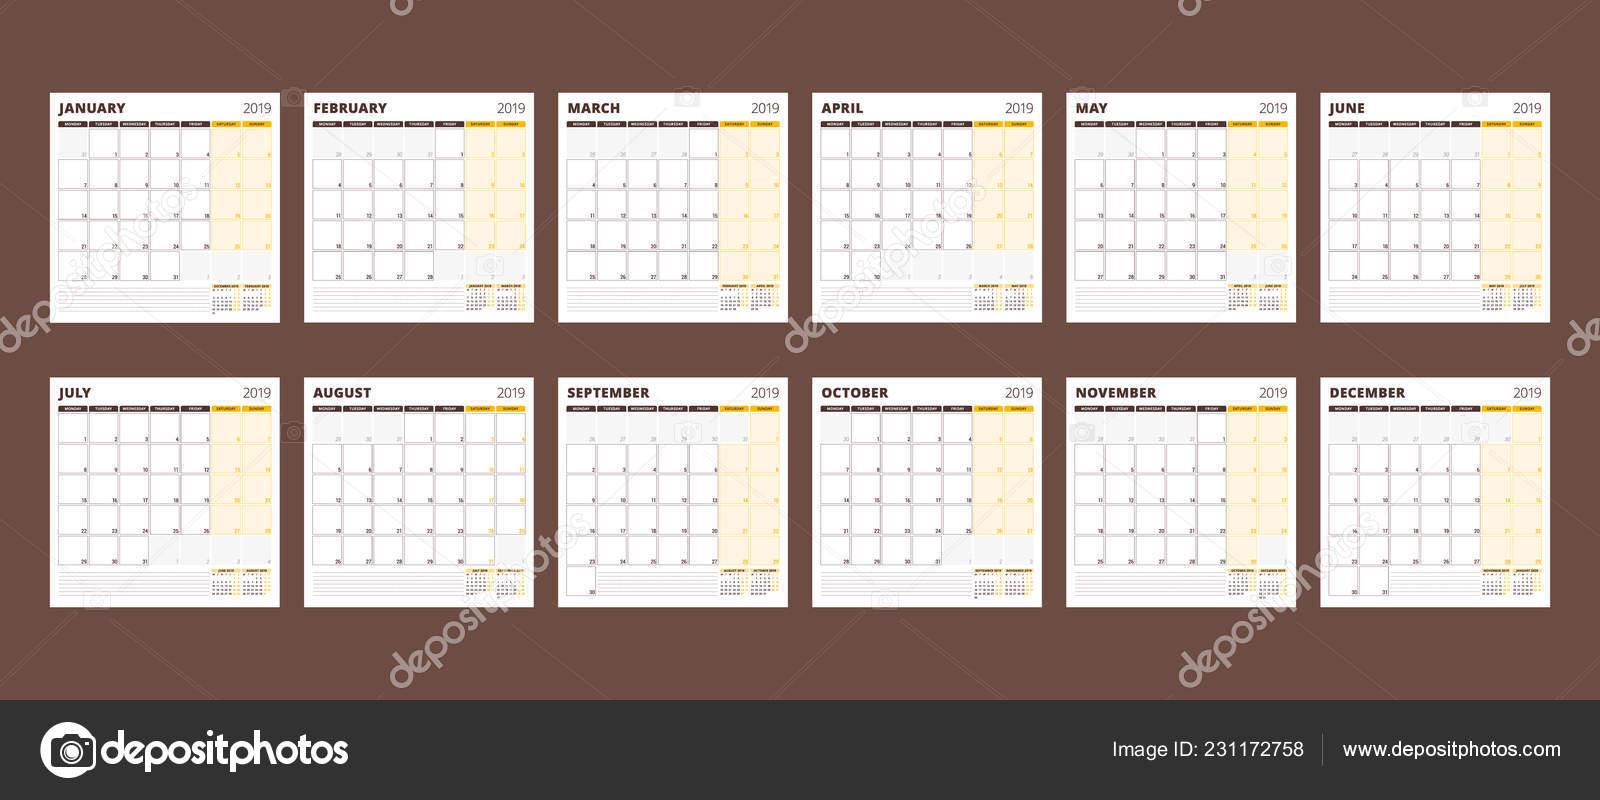 Calendario 2019 Julio Agosto Septiembre.Plantilla Calendario Para Ano 2019 Conjunto Meses Enero